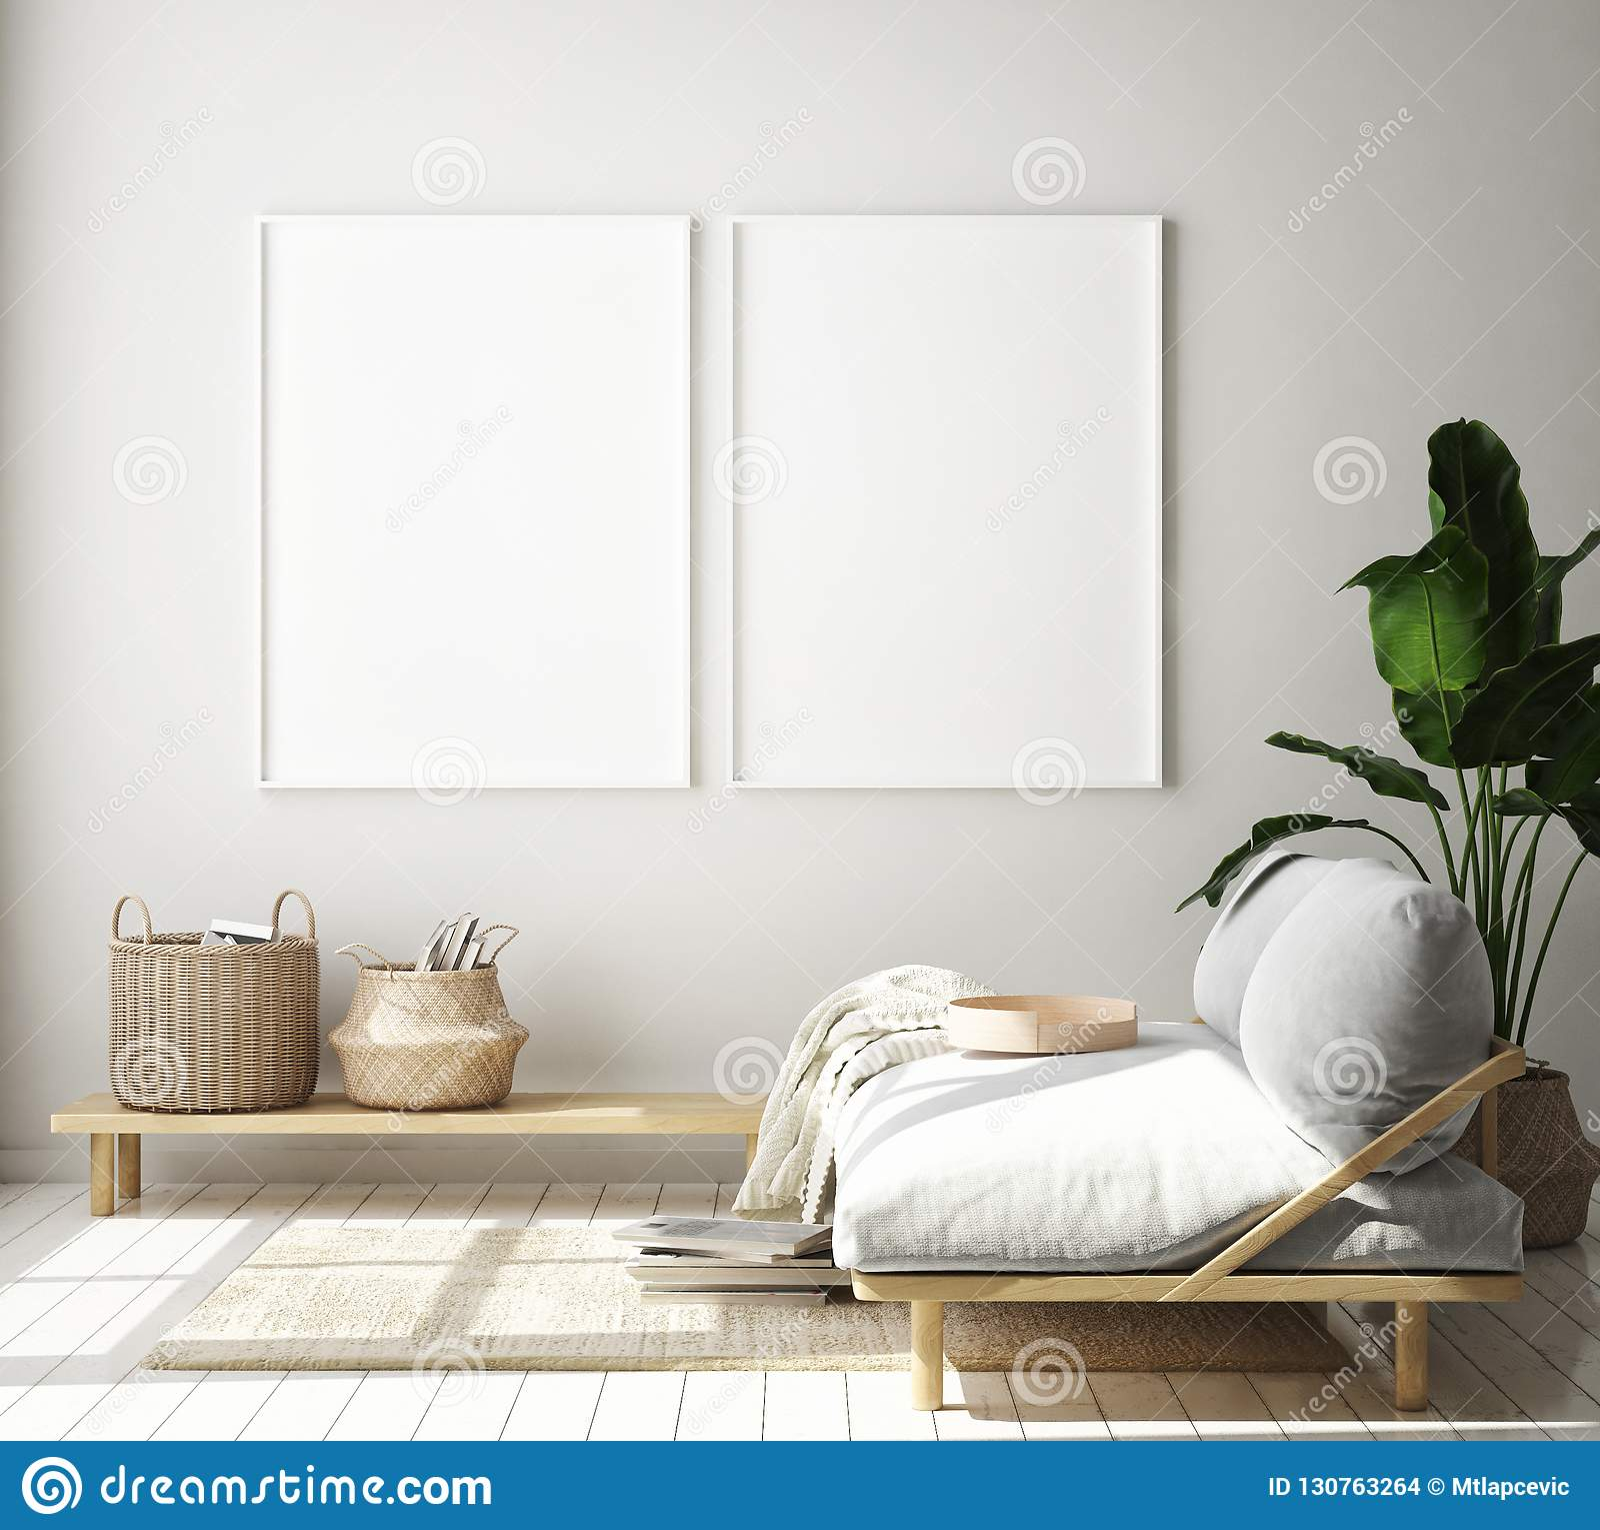 De spot op affichekader op hipster binnenlandse achtergrond, woonkamer, Skandinavische 3D stijl, geeft, 3D illustratie terug